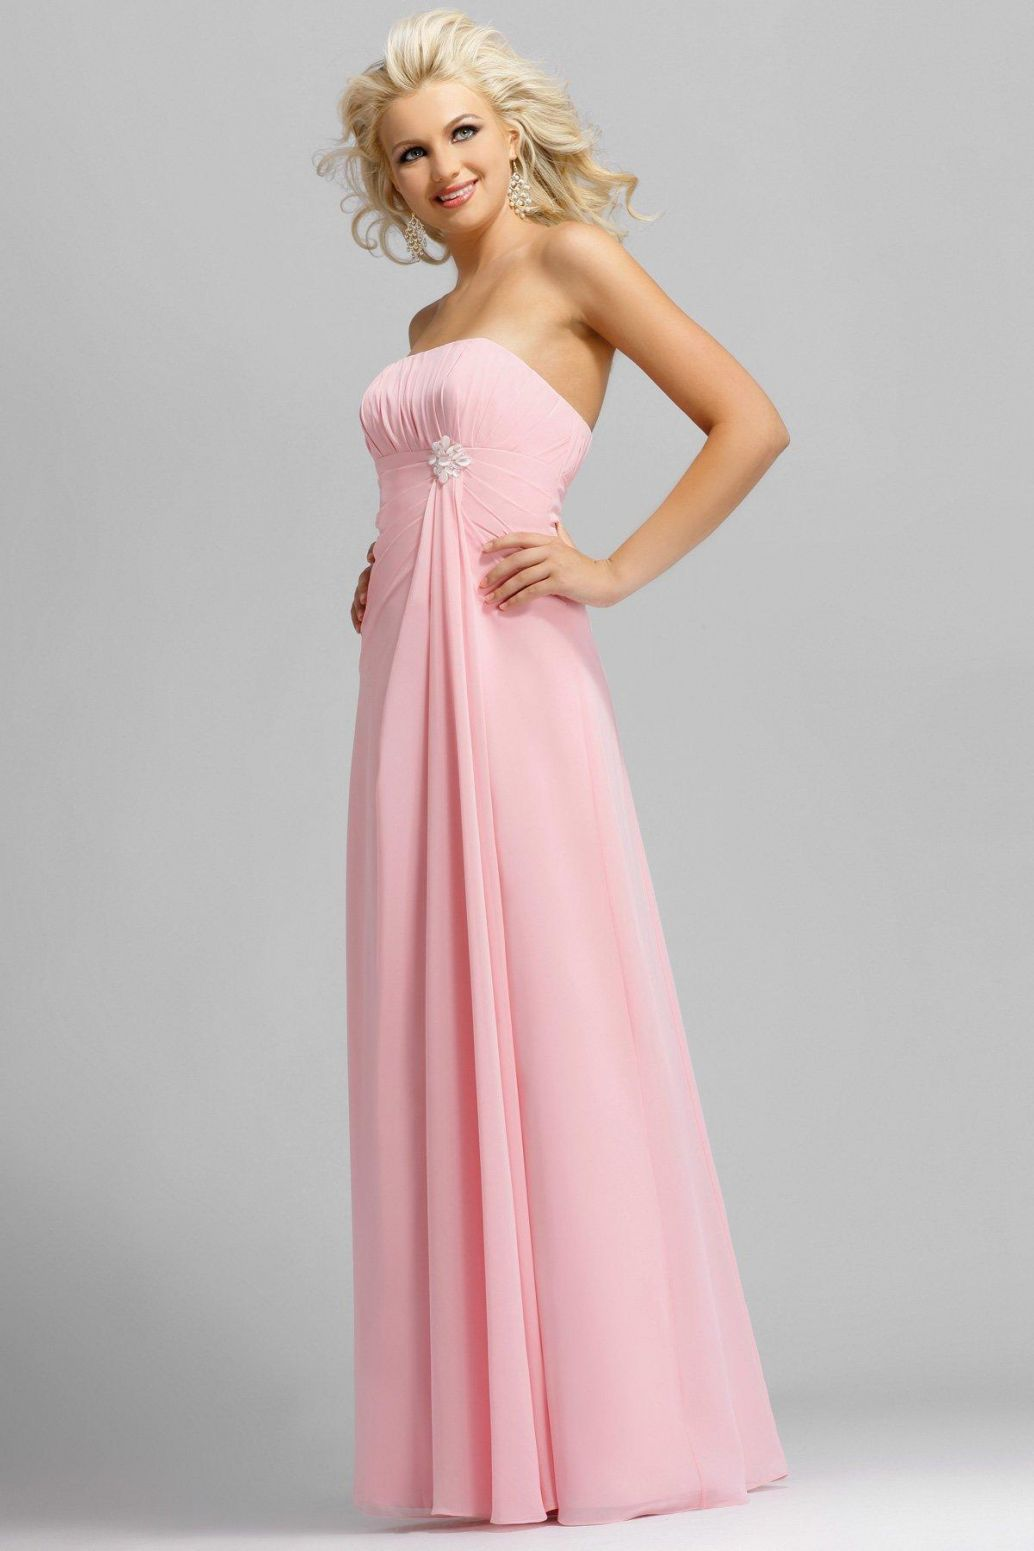 Images bridesmaid dresses long bright pink bridesmaid dress images bridesmaid dresses long bright pink bridesmaid dress designs ombrellifo Choice Image